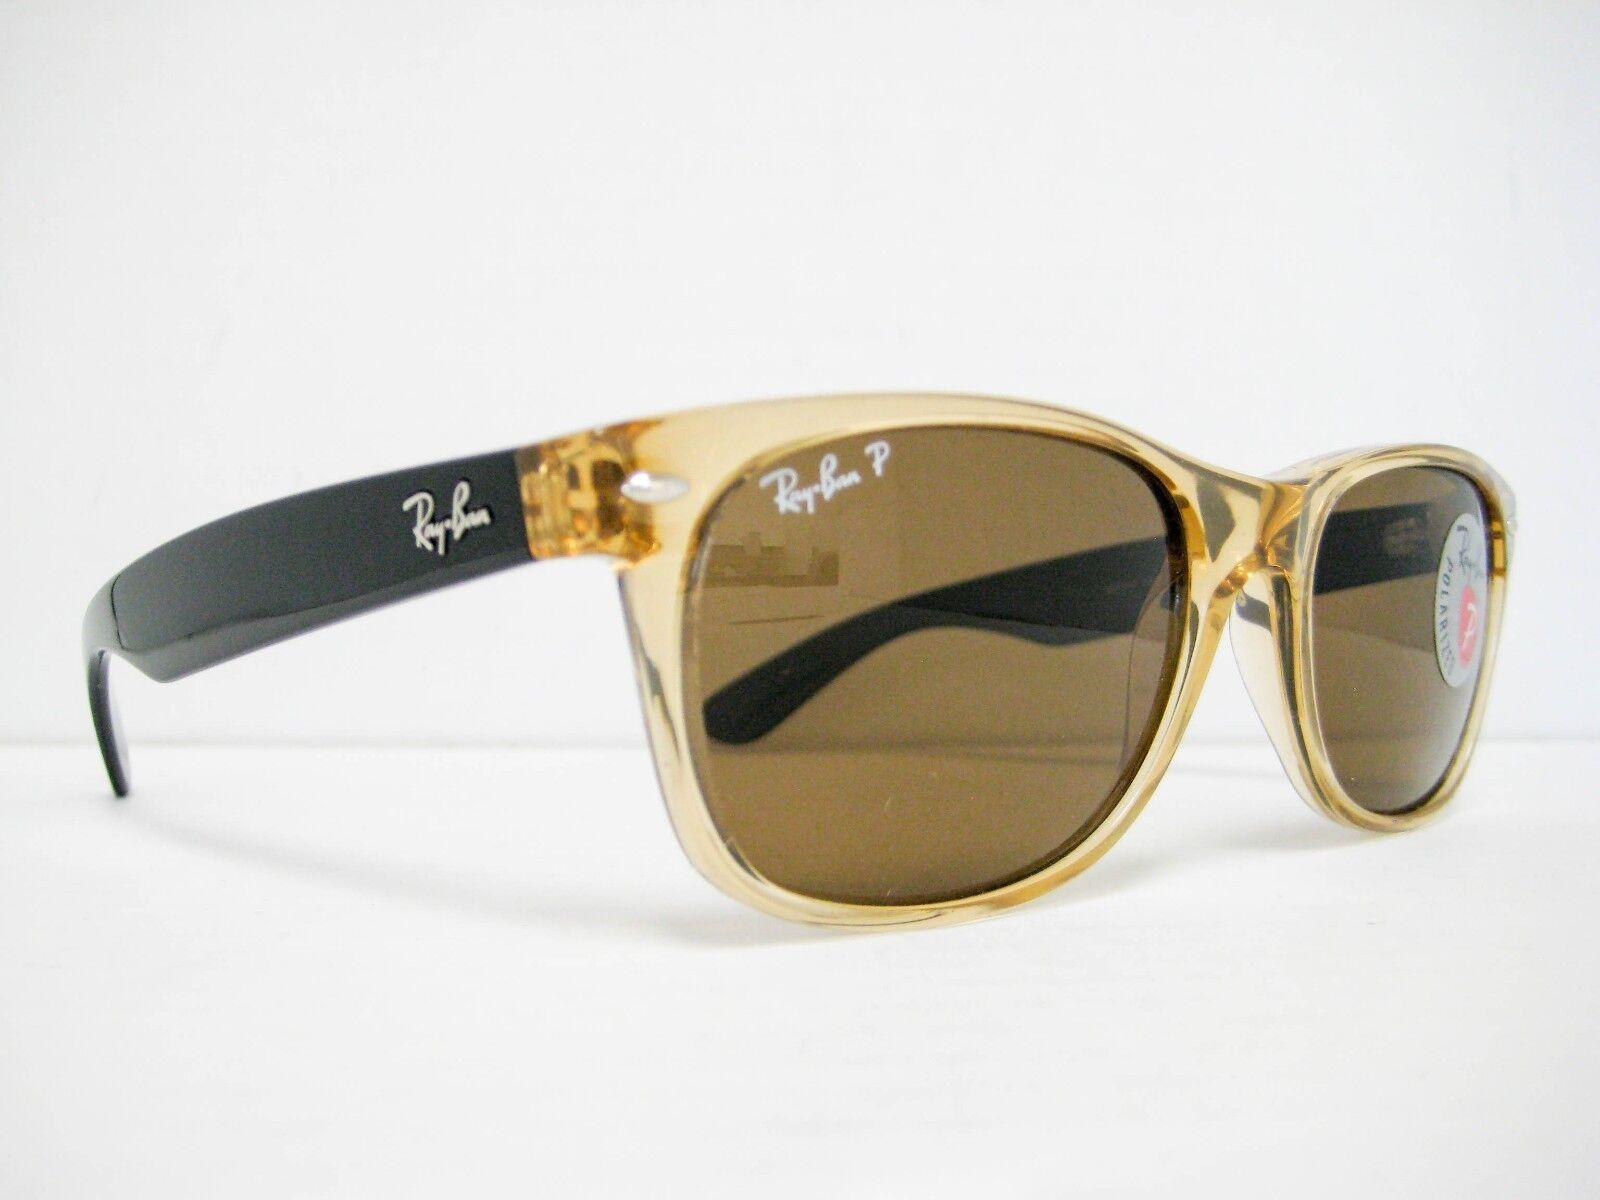 7aeb7529e62d Ray-Ban Sunglasses Rb2132 945 57 Wayfarer Honey Crystal Brown ...